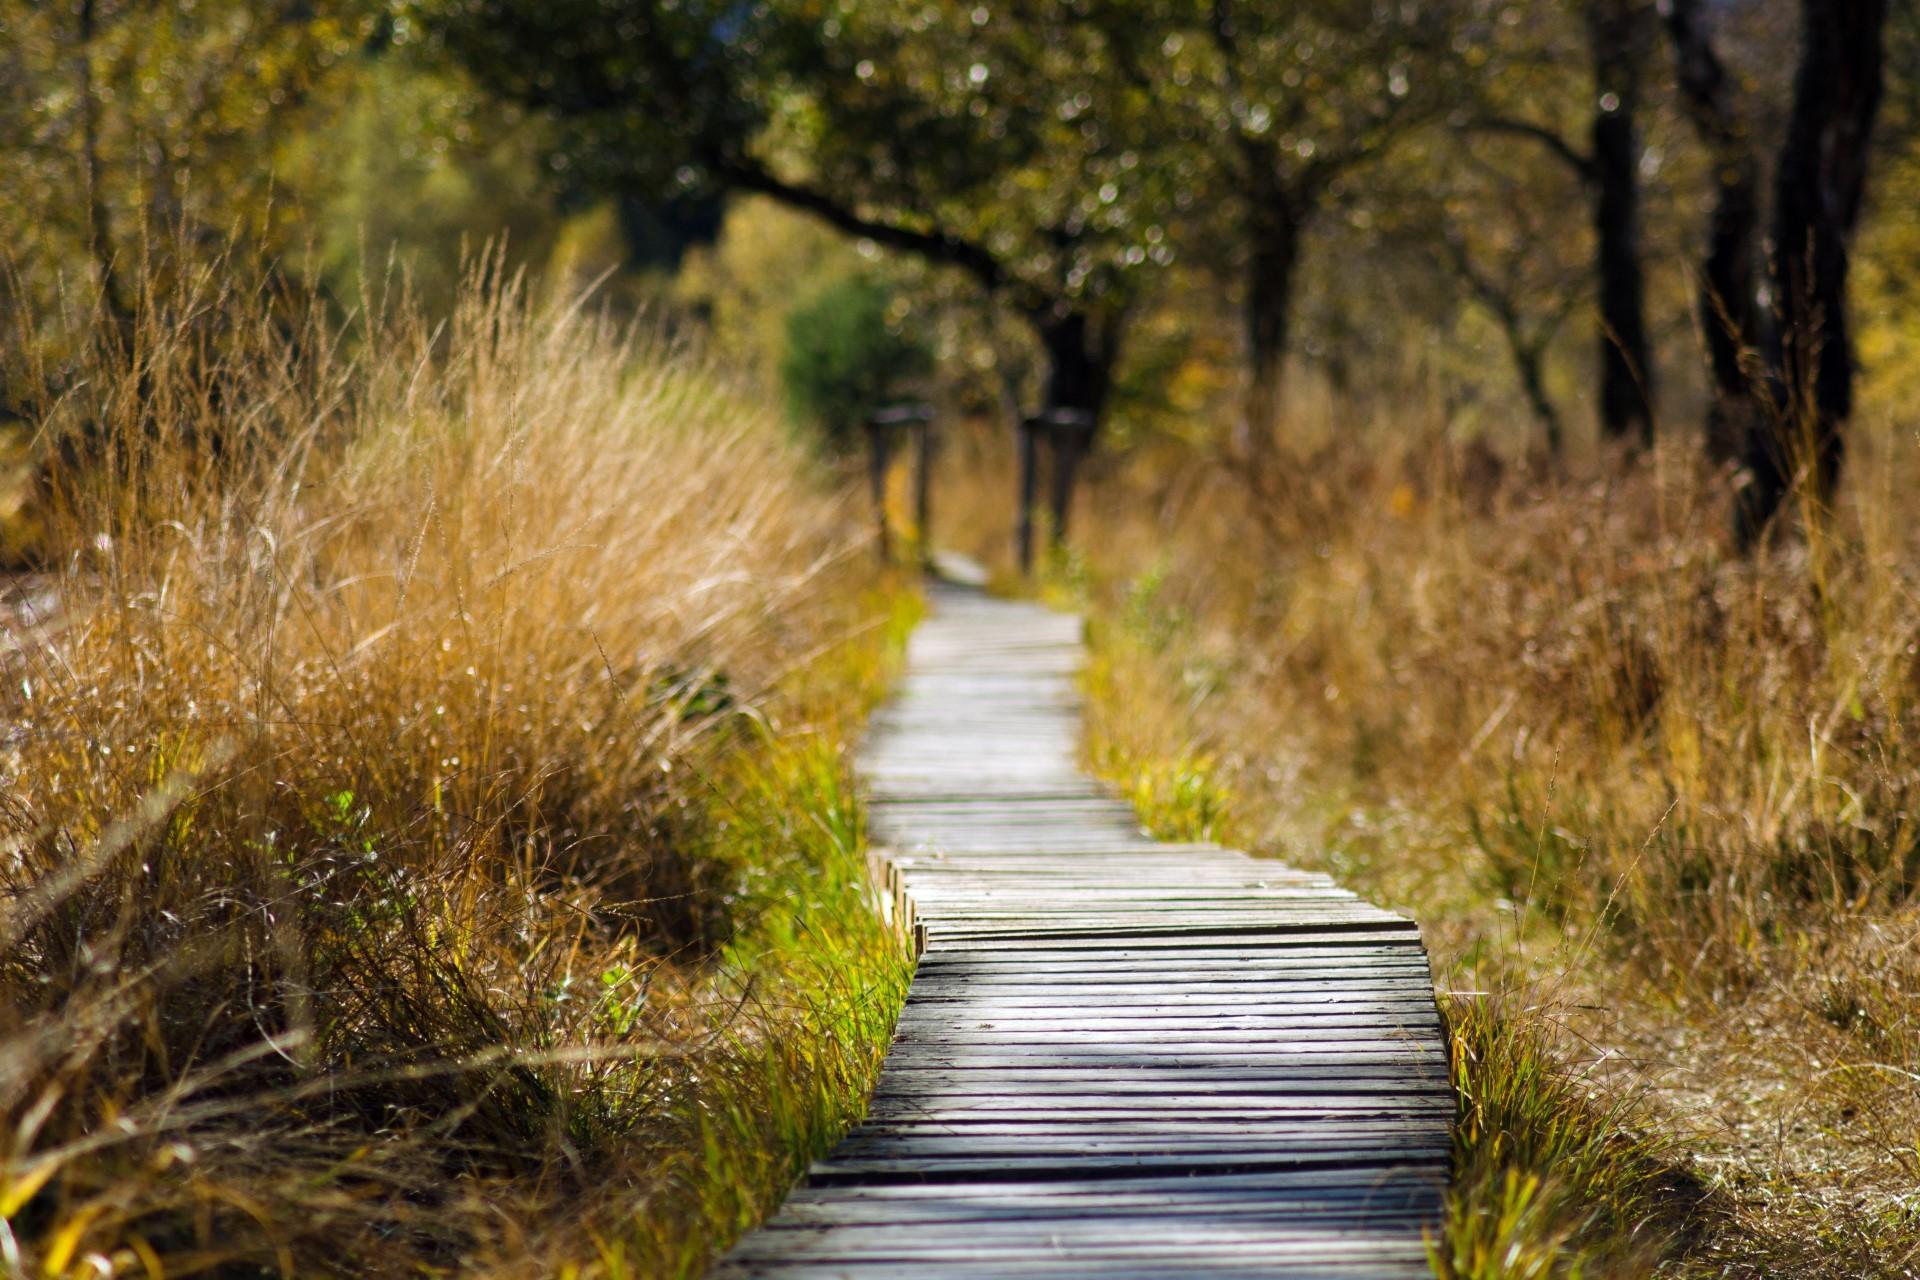 adventure-boardwalk-daylight-289327_1920x1280px